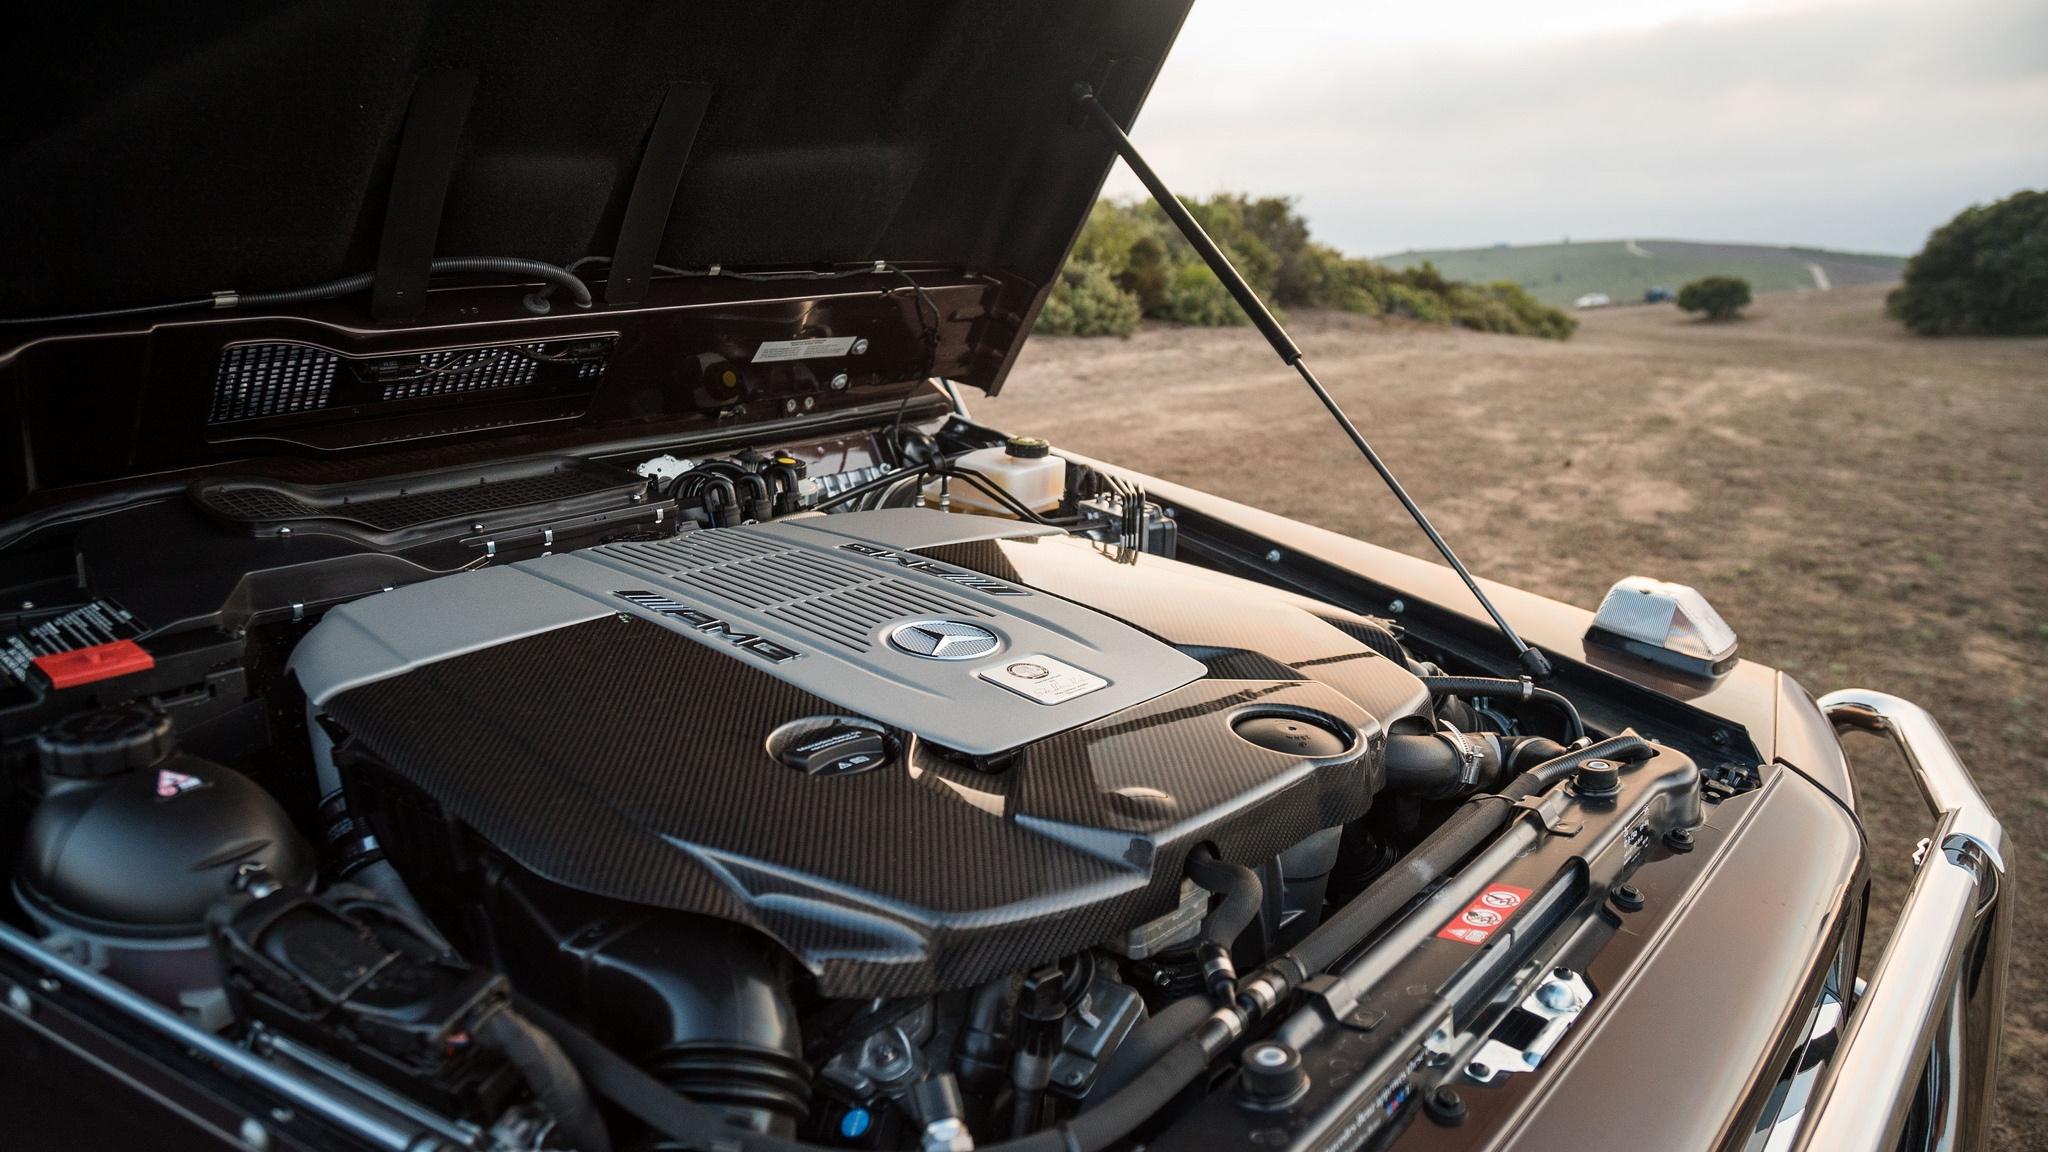 Mercedes G65 AMG Engine